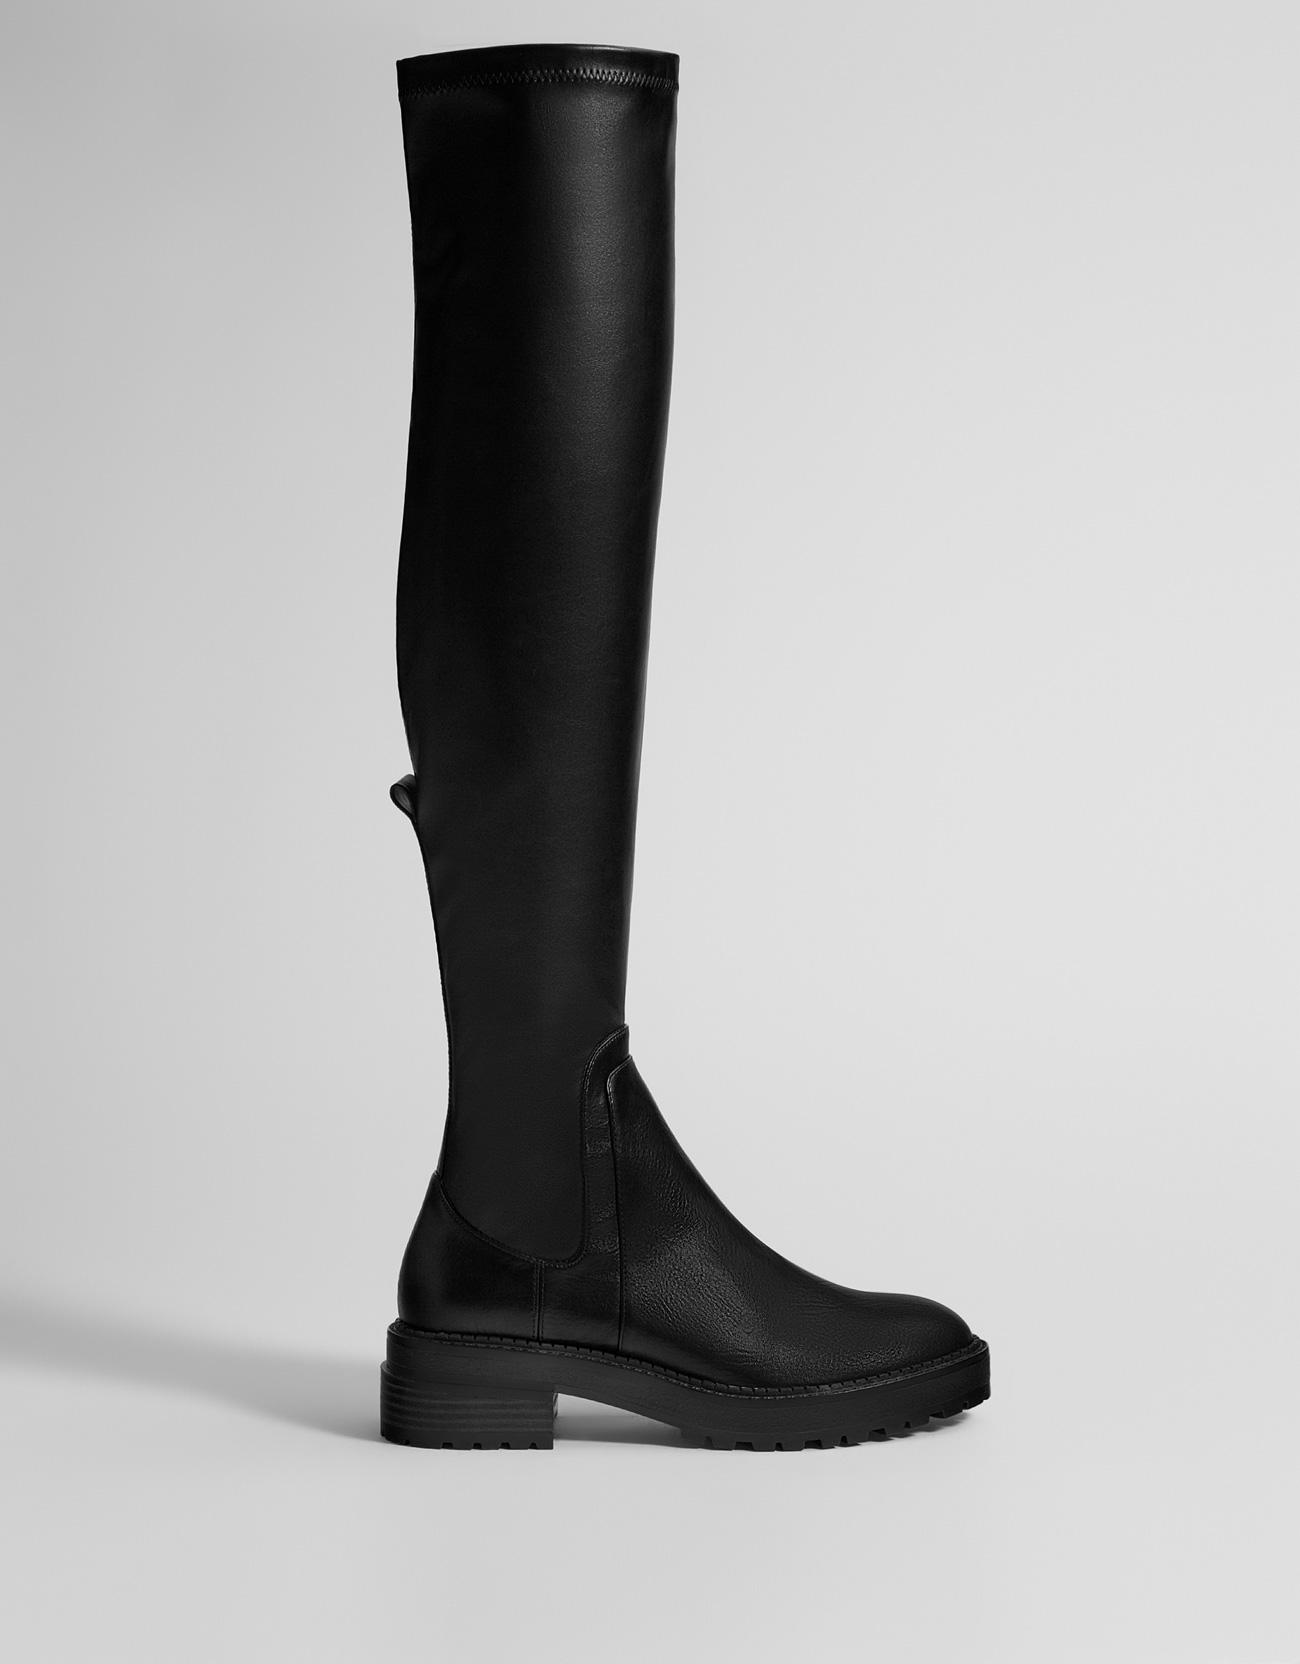 5d362e1edb42 Women Over The Knee Boots